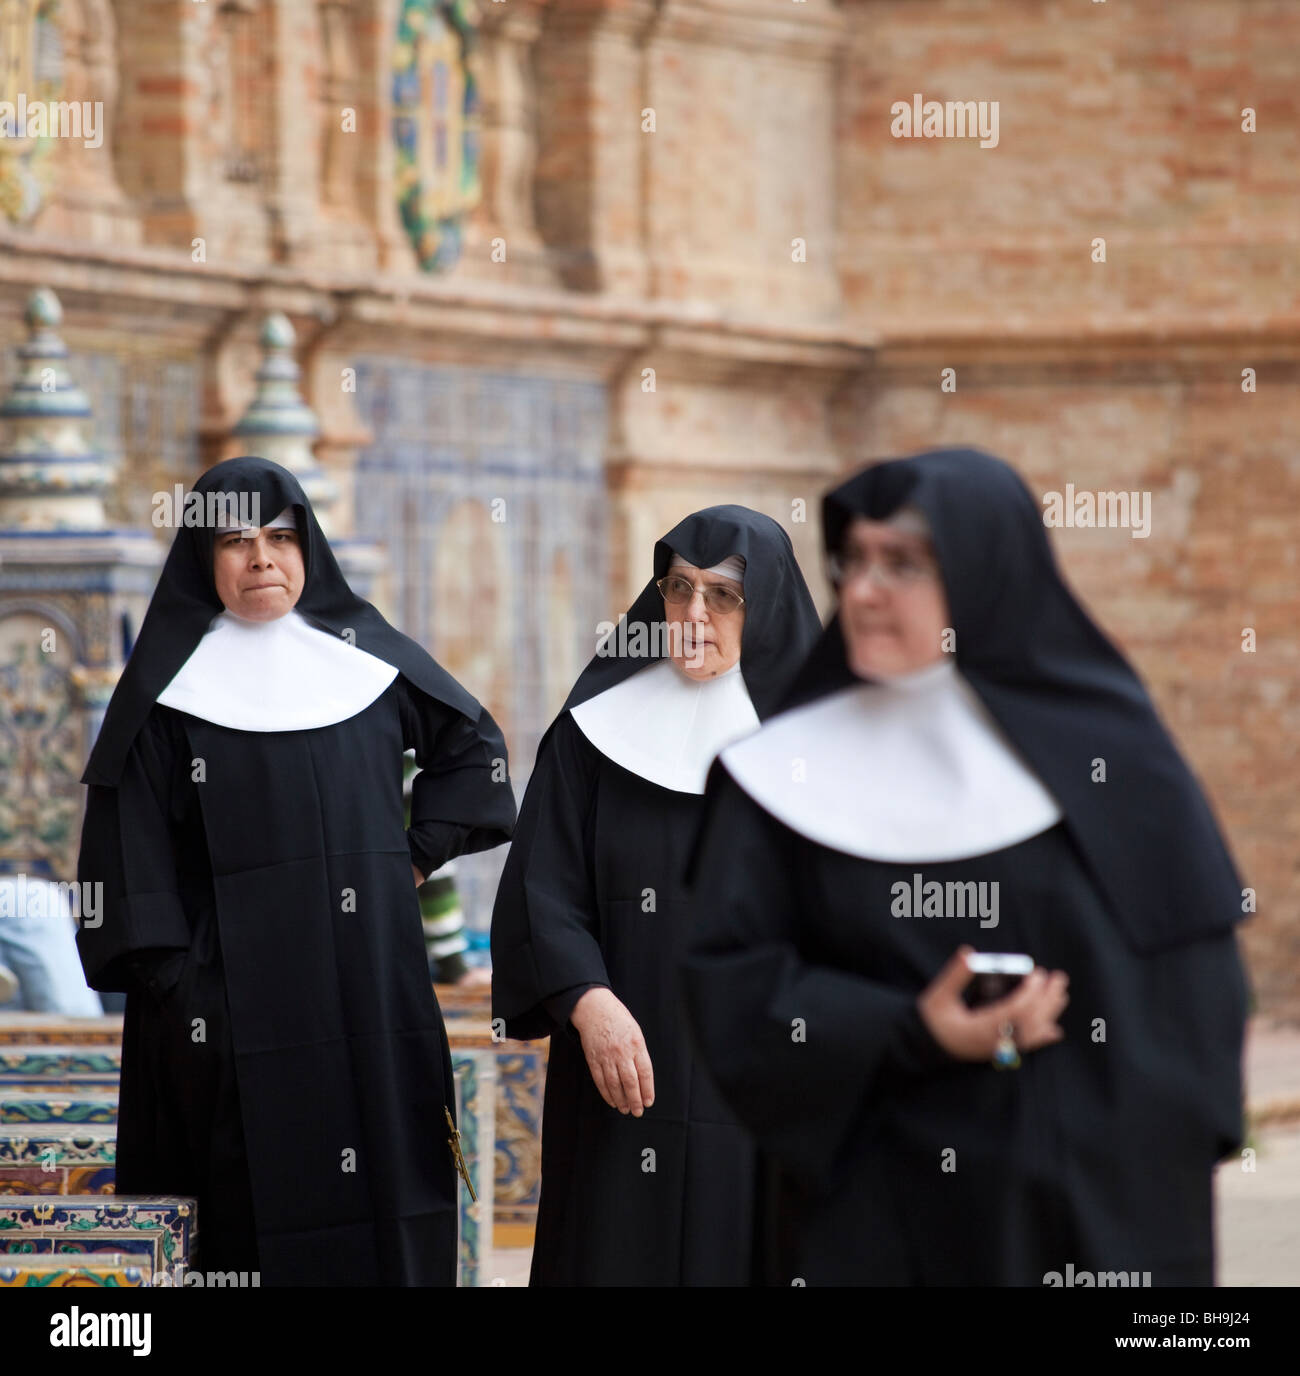 Spanish nuns, visiting Plaza de Espagna, Seville, Spain - Stock Image